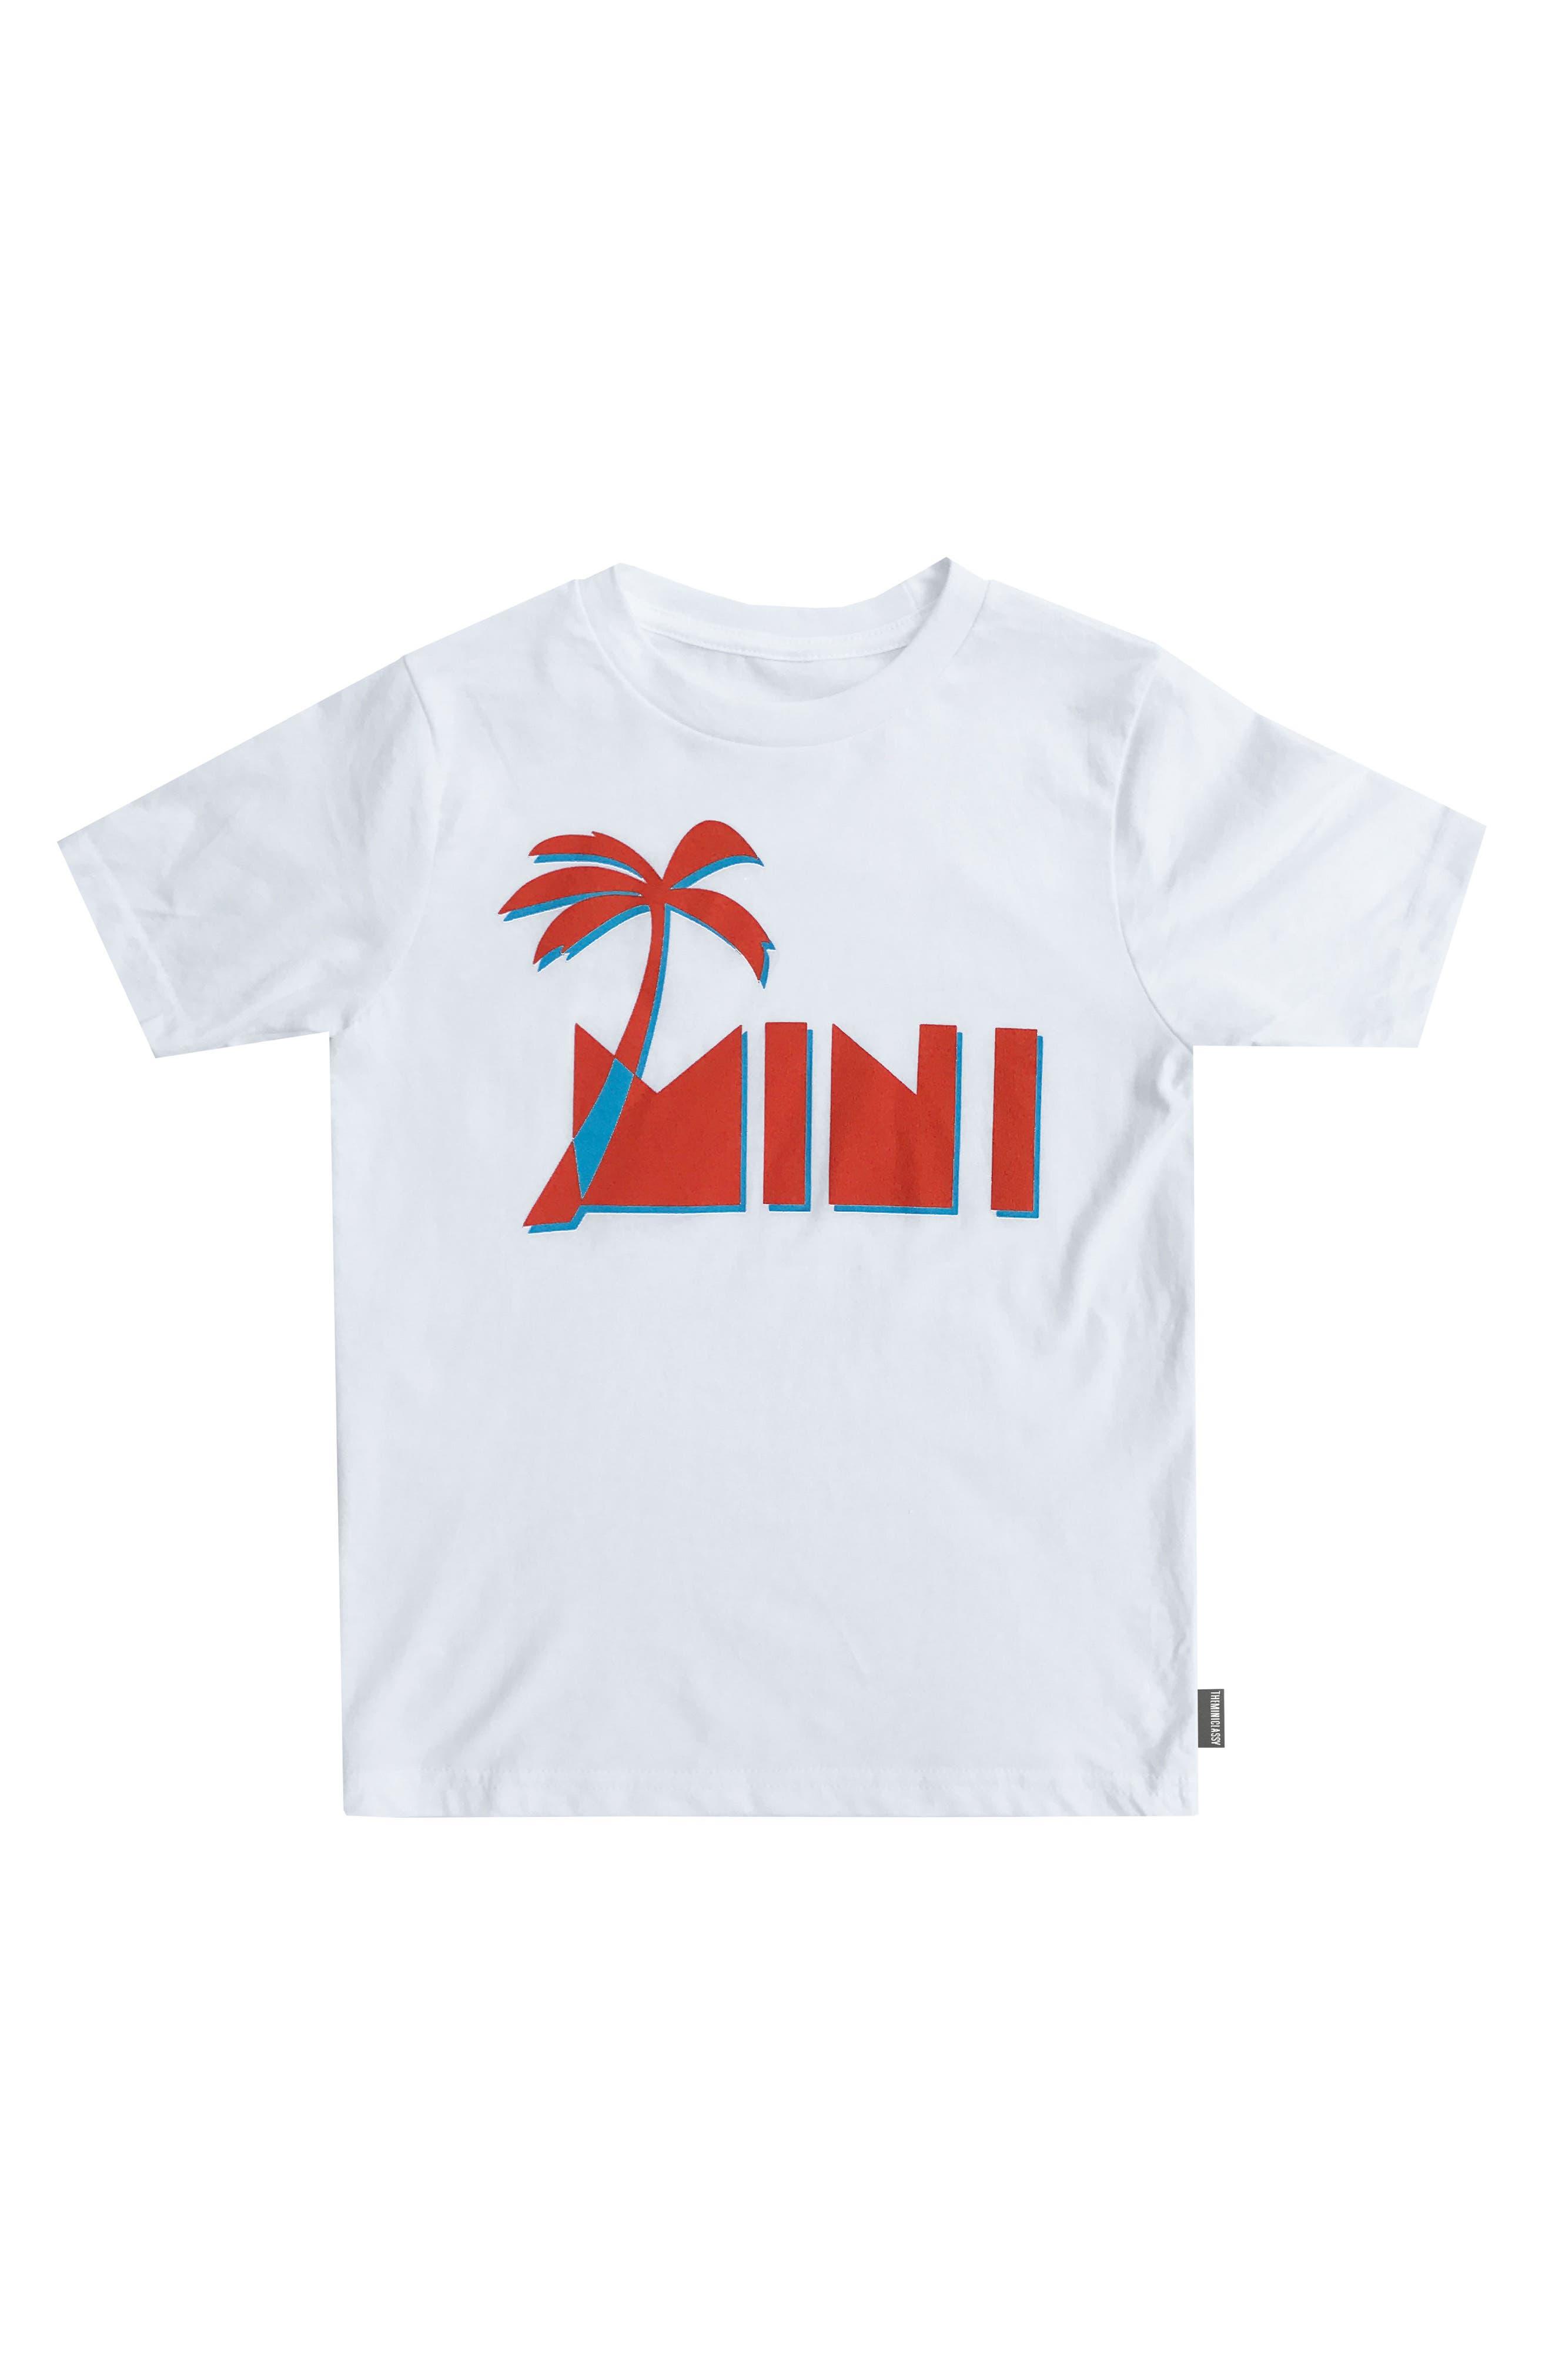 THEMINICLASSY Graphic Crewneck T-Shirt (Toddler Boys & Little Boys)